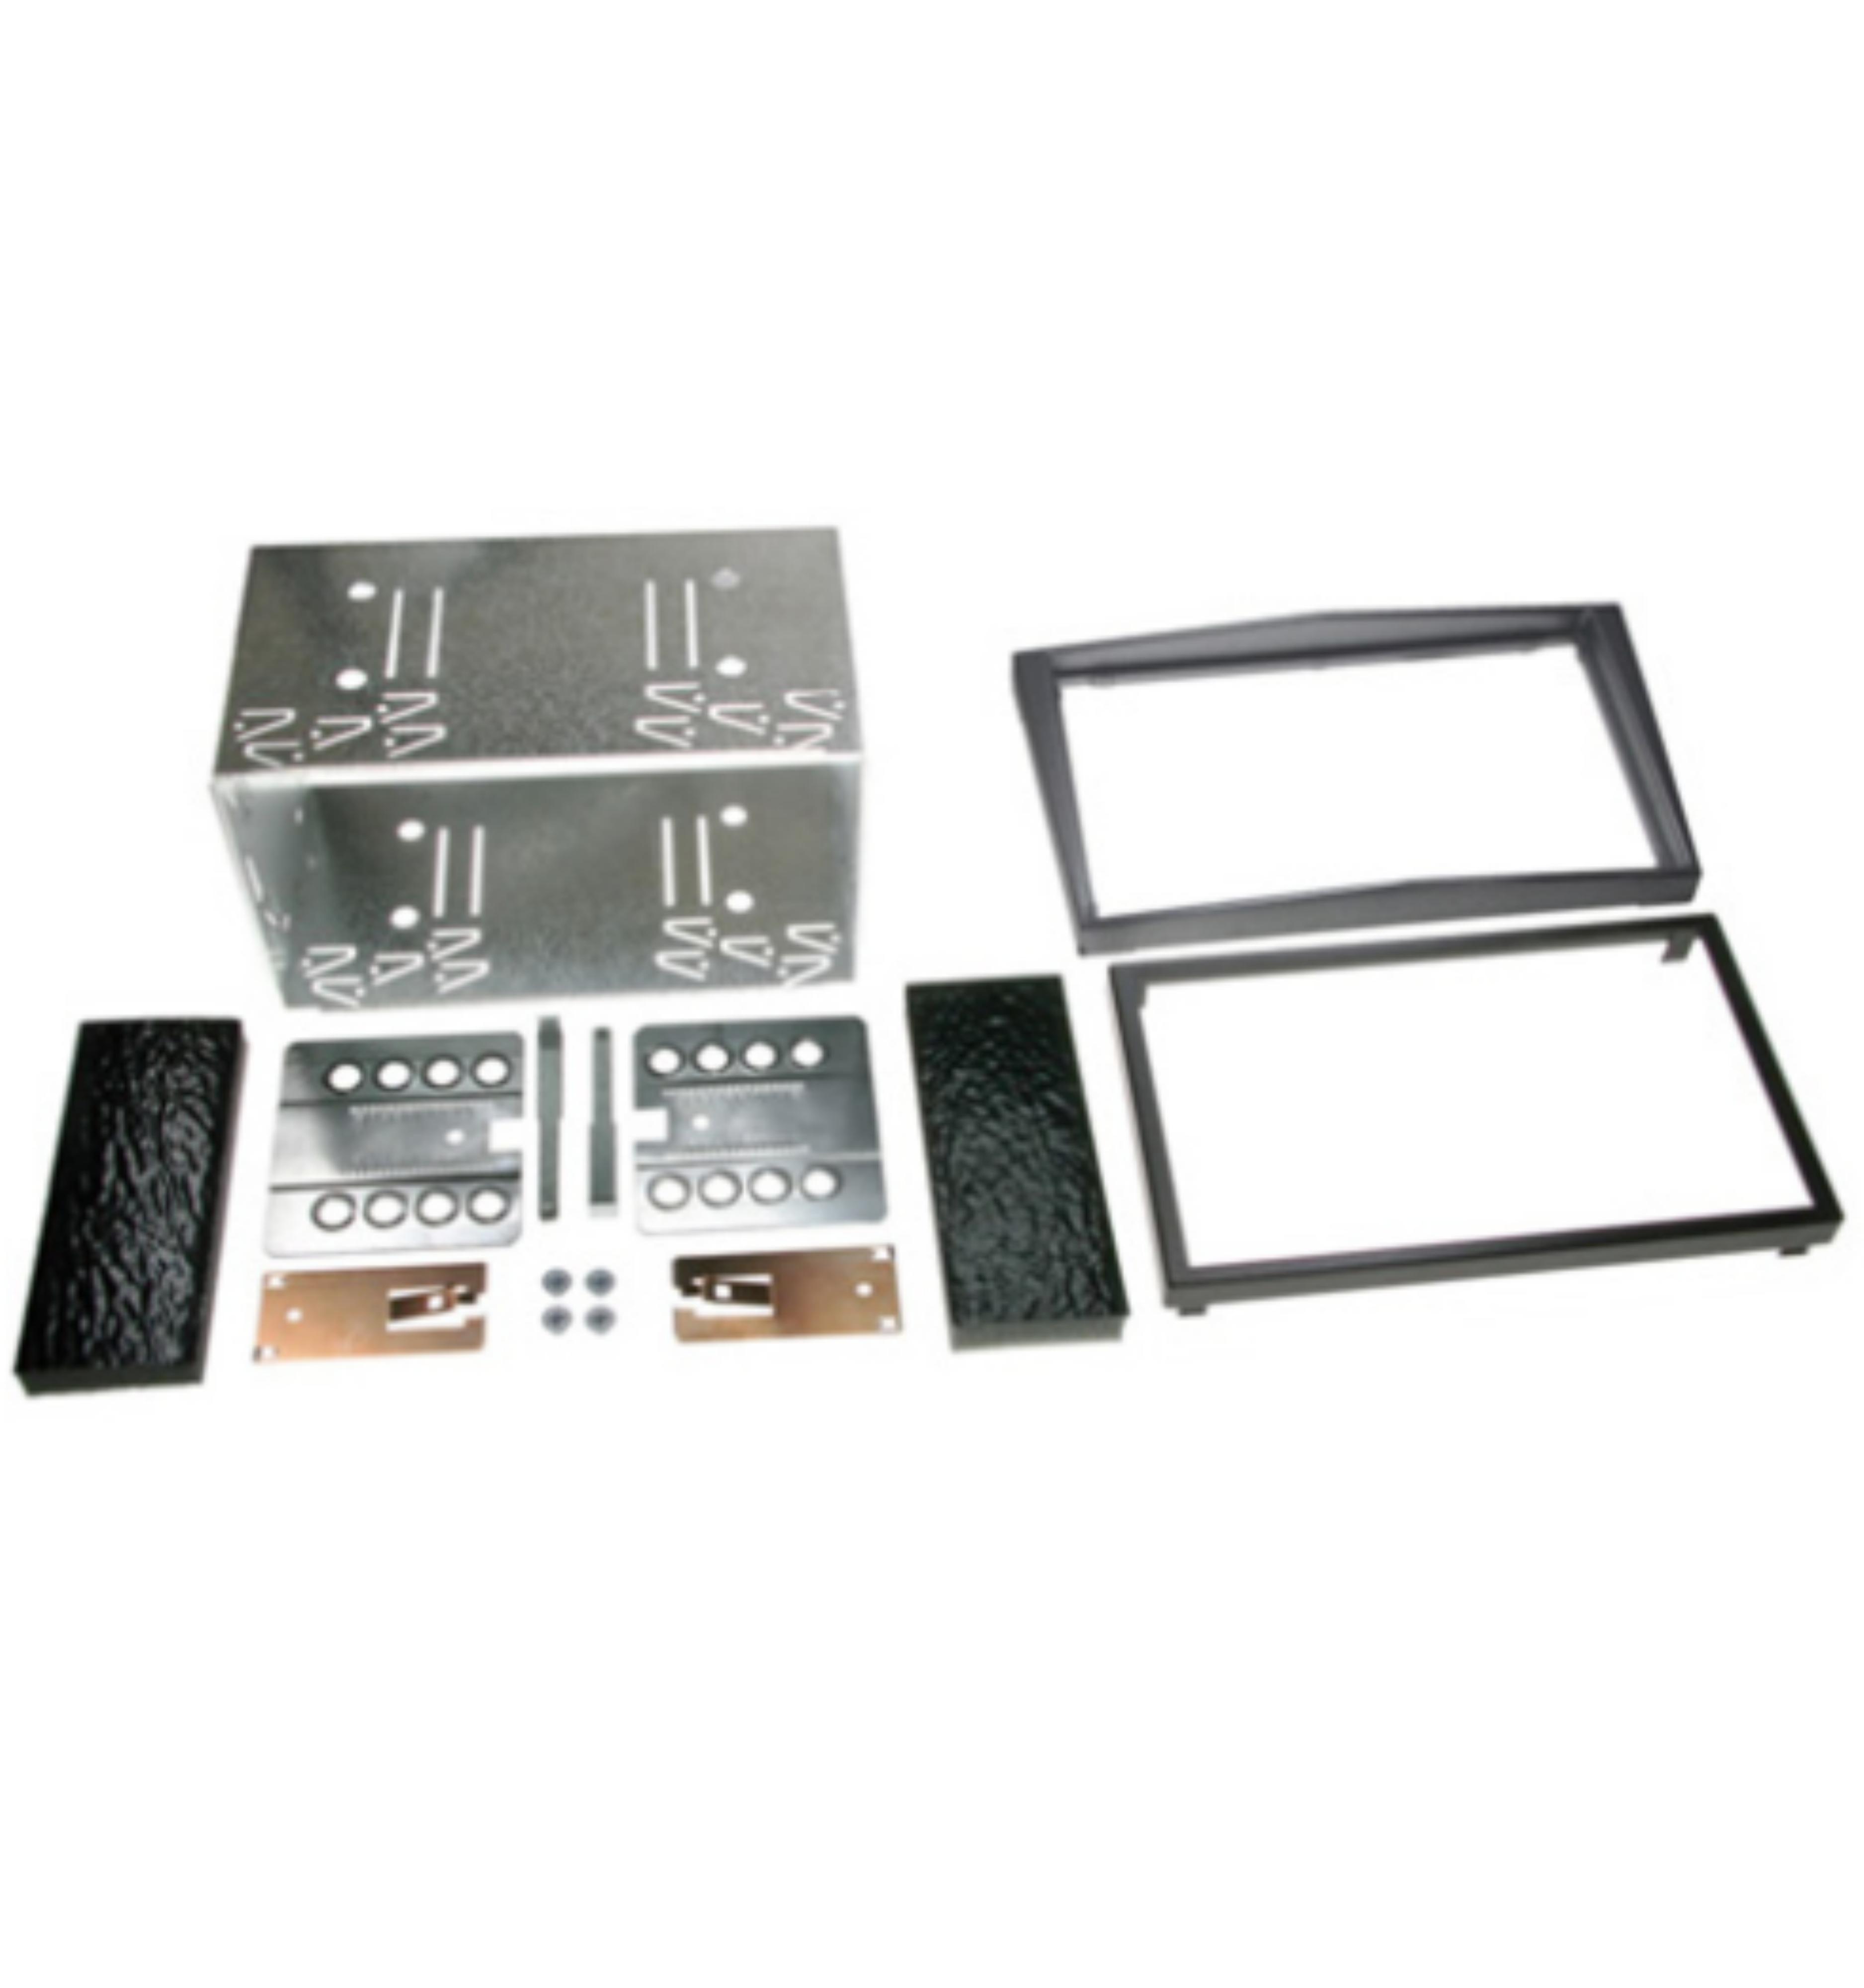 C2 Car Stereo Double Din Fascia Plate For Vauxhall Zafira B/Corsa/Astra H/Antara